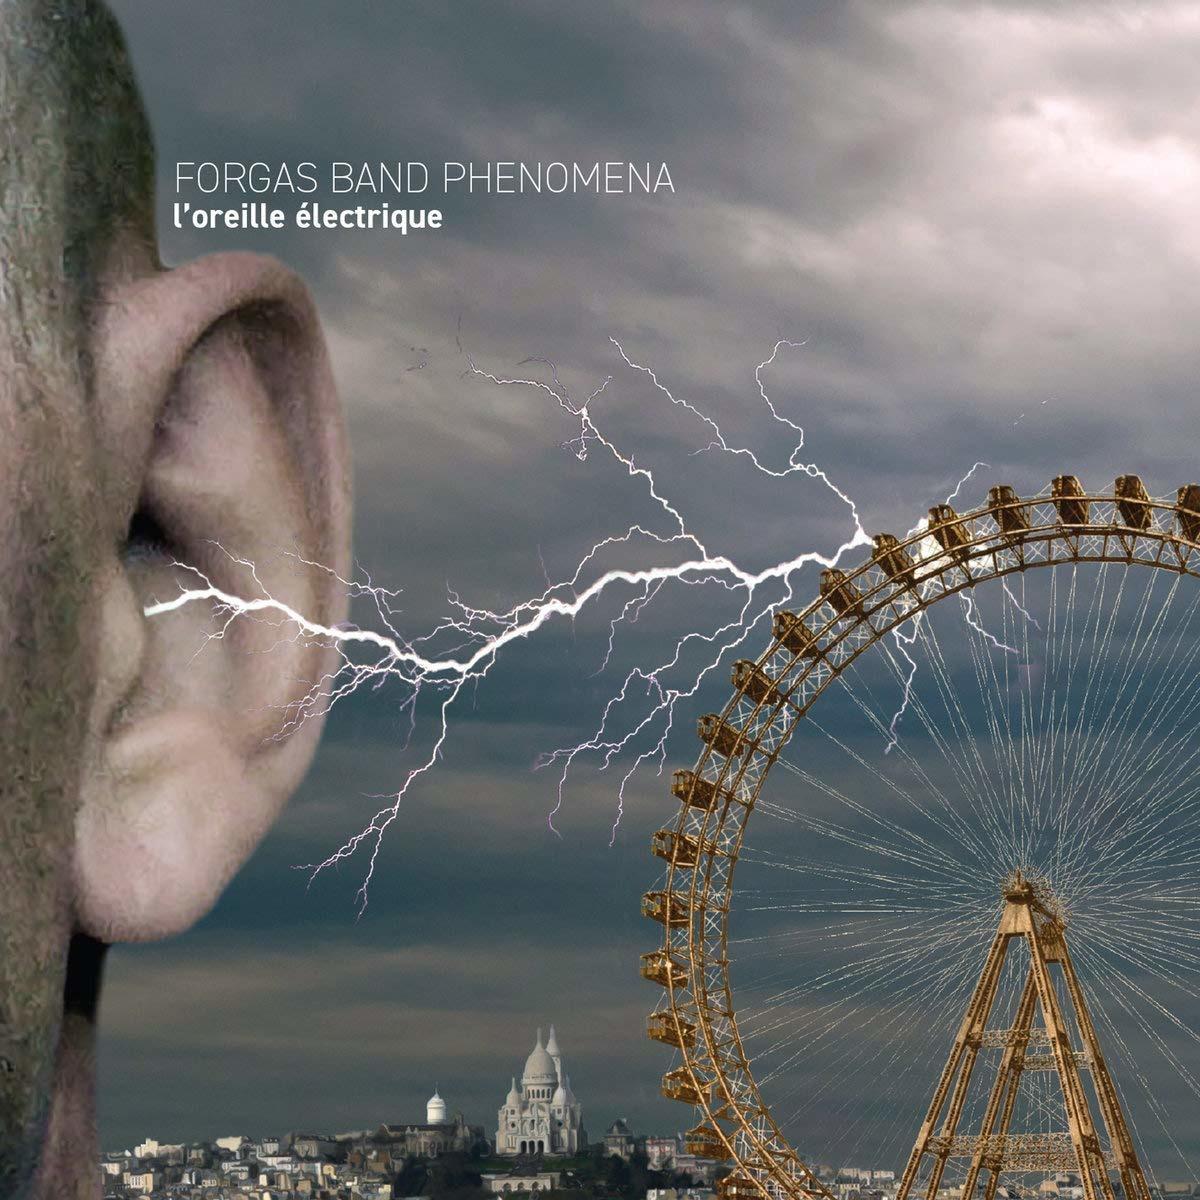 L'oreille Electrique [the Electric Ear] - Forgas Band Phenomenom - Musik - CUNEIFORM - 0045775044729 - November 9, 2018